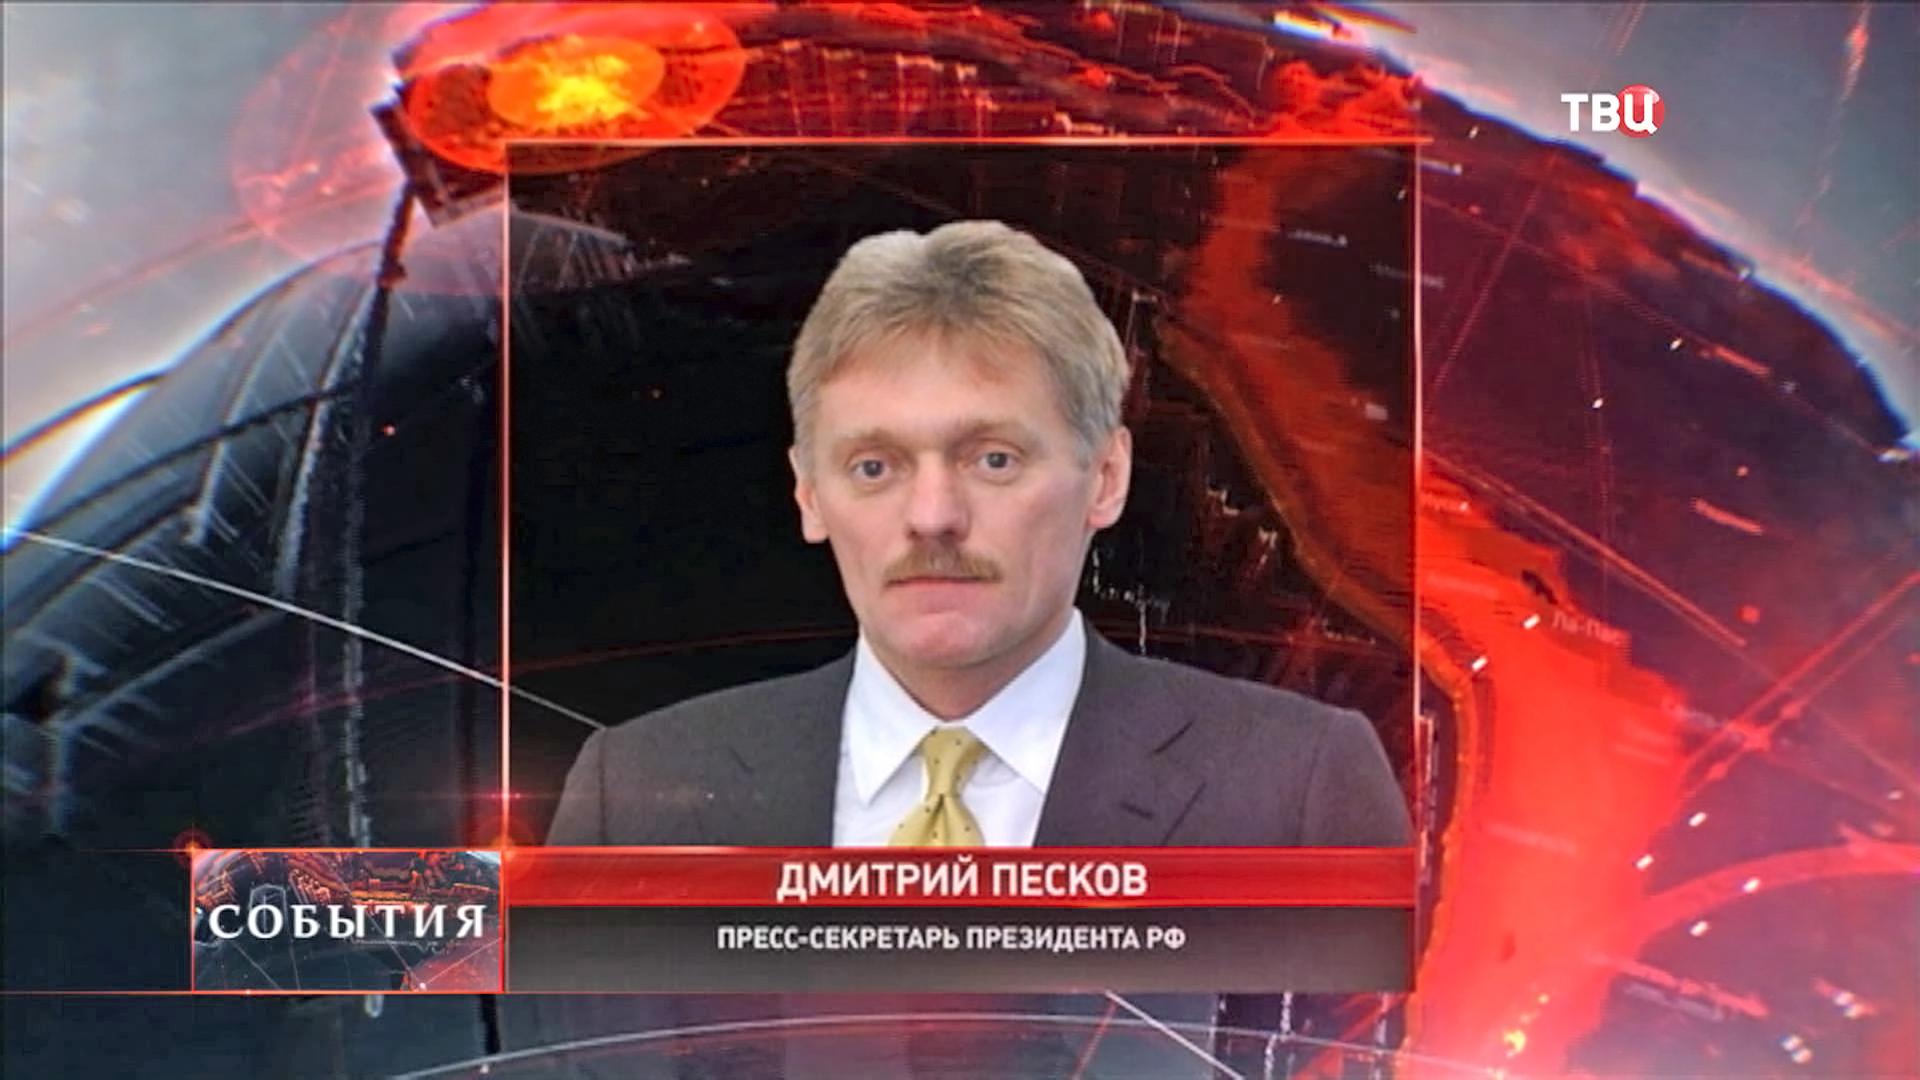 Пресс-секретарь президент РФ